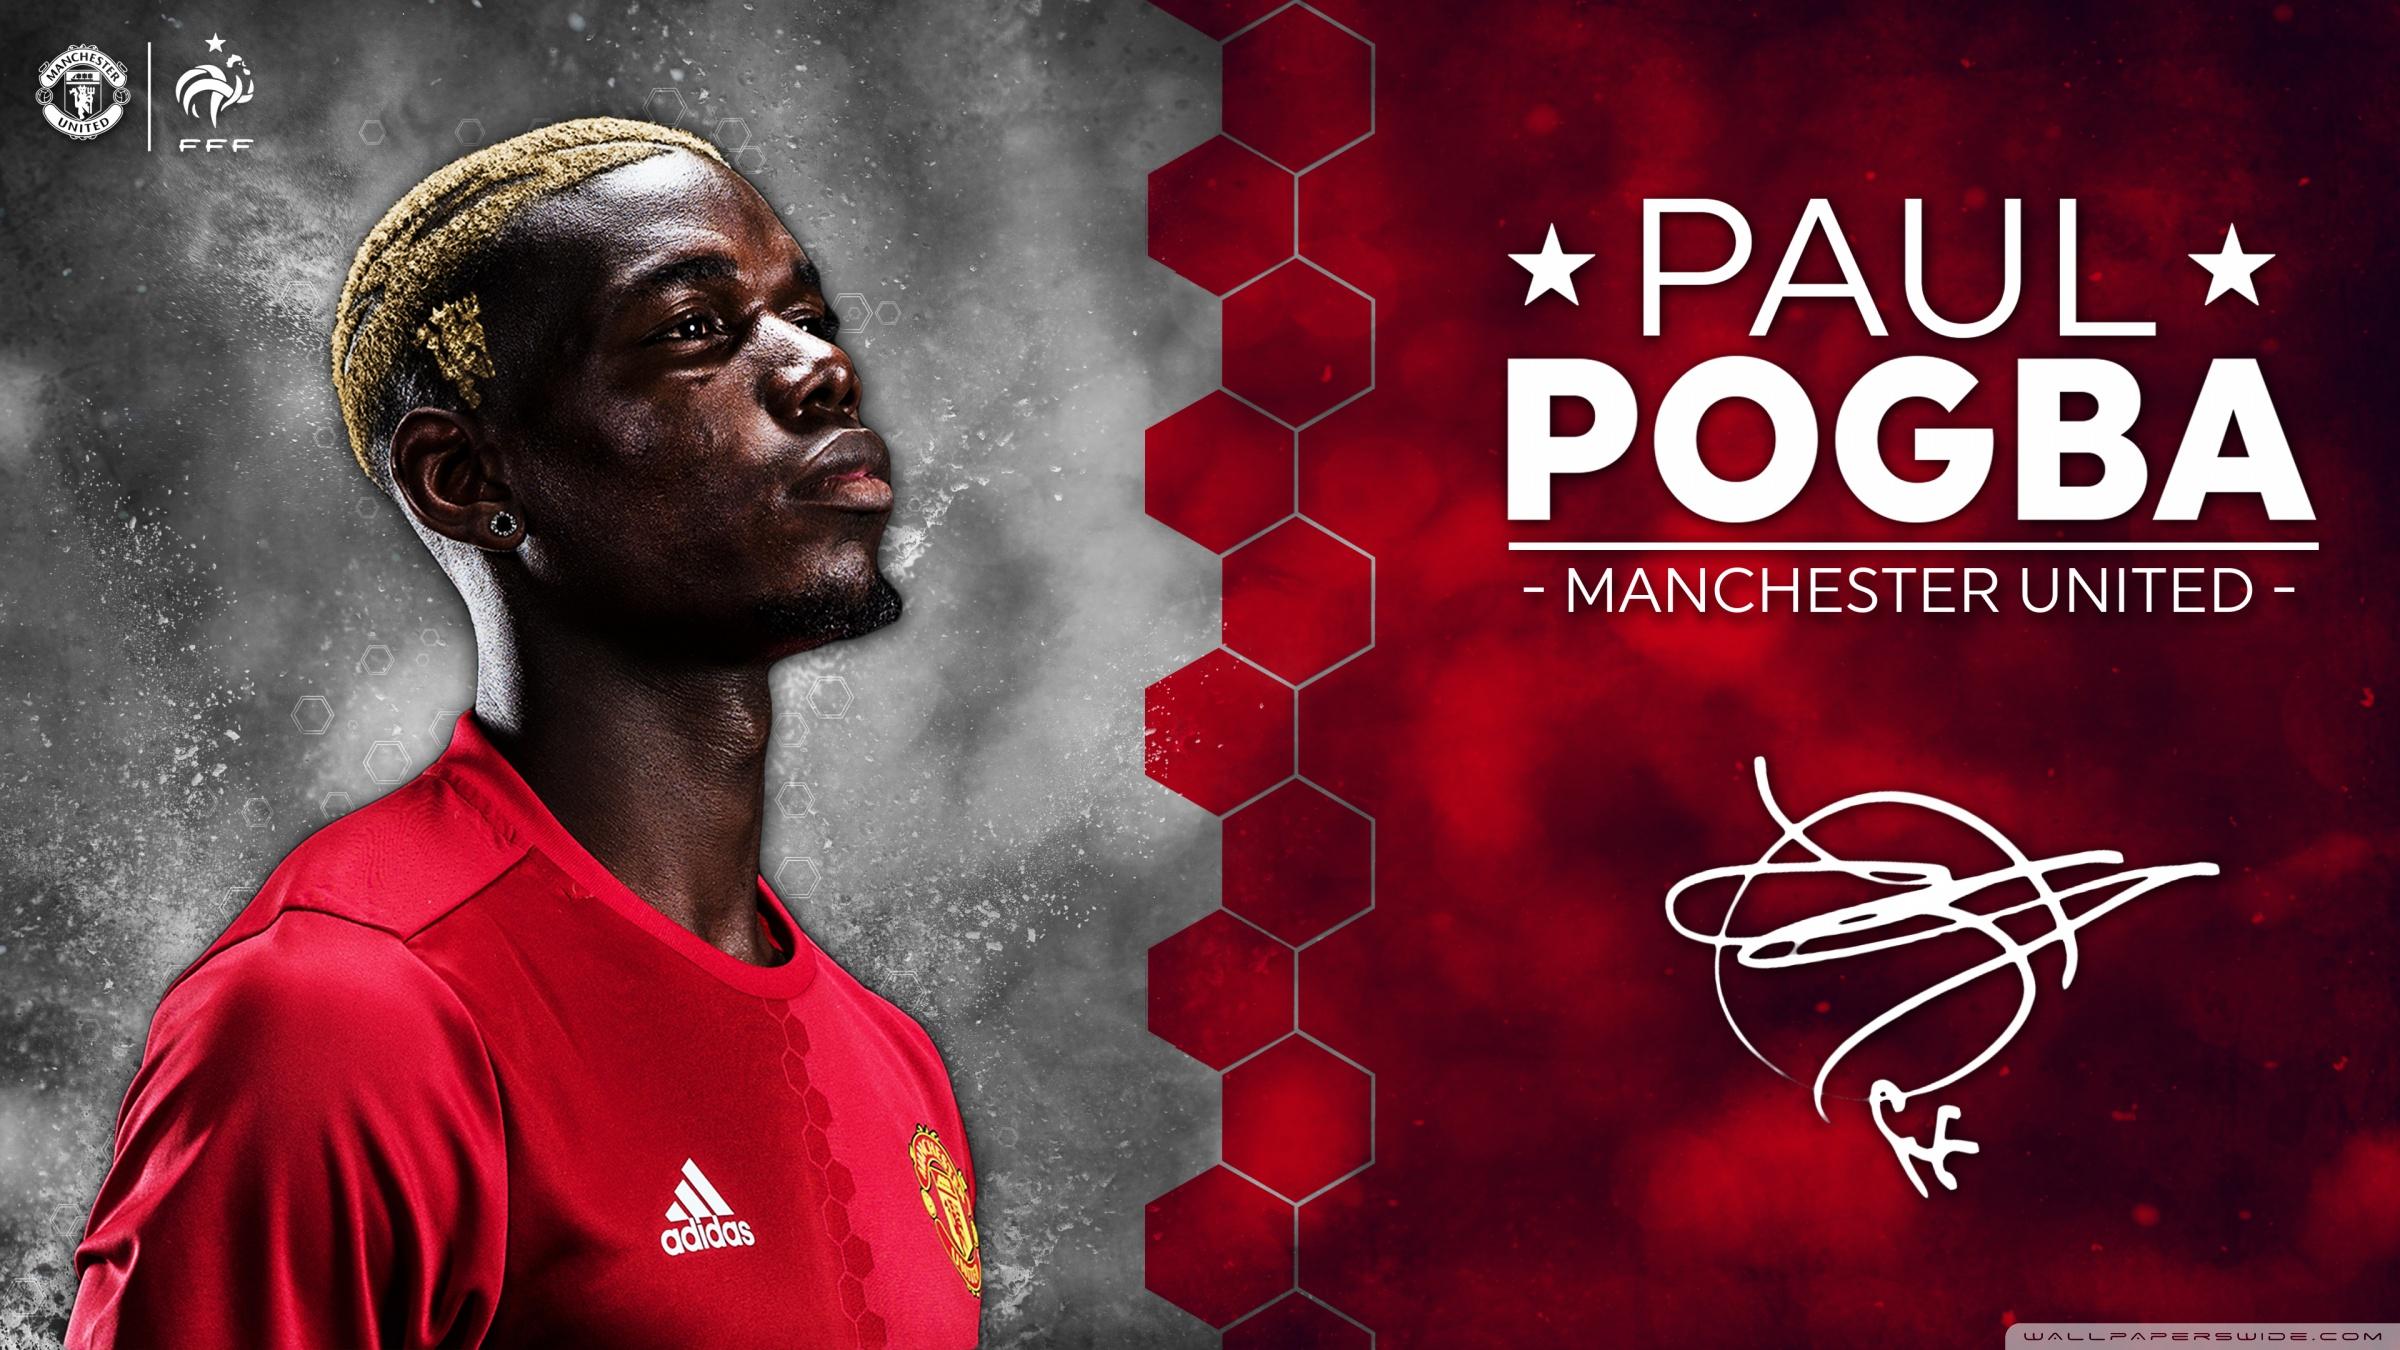 Paul Pogba Manchester United 2016 17 4K HD Desktop Wallpaper 2400x1350